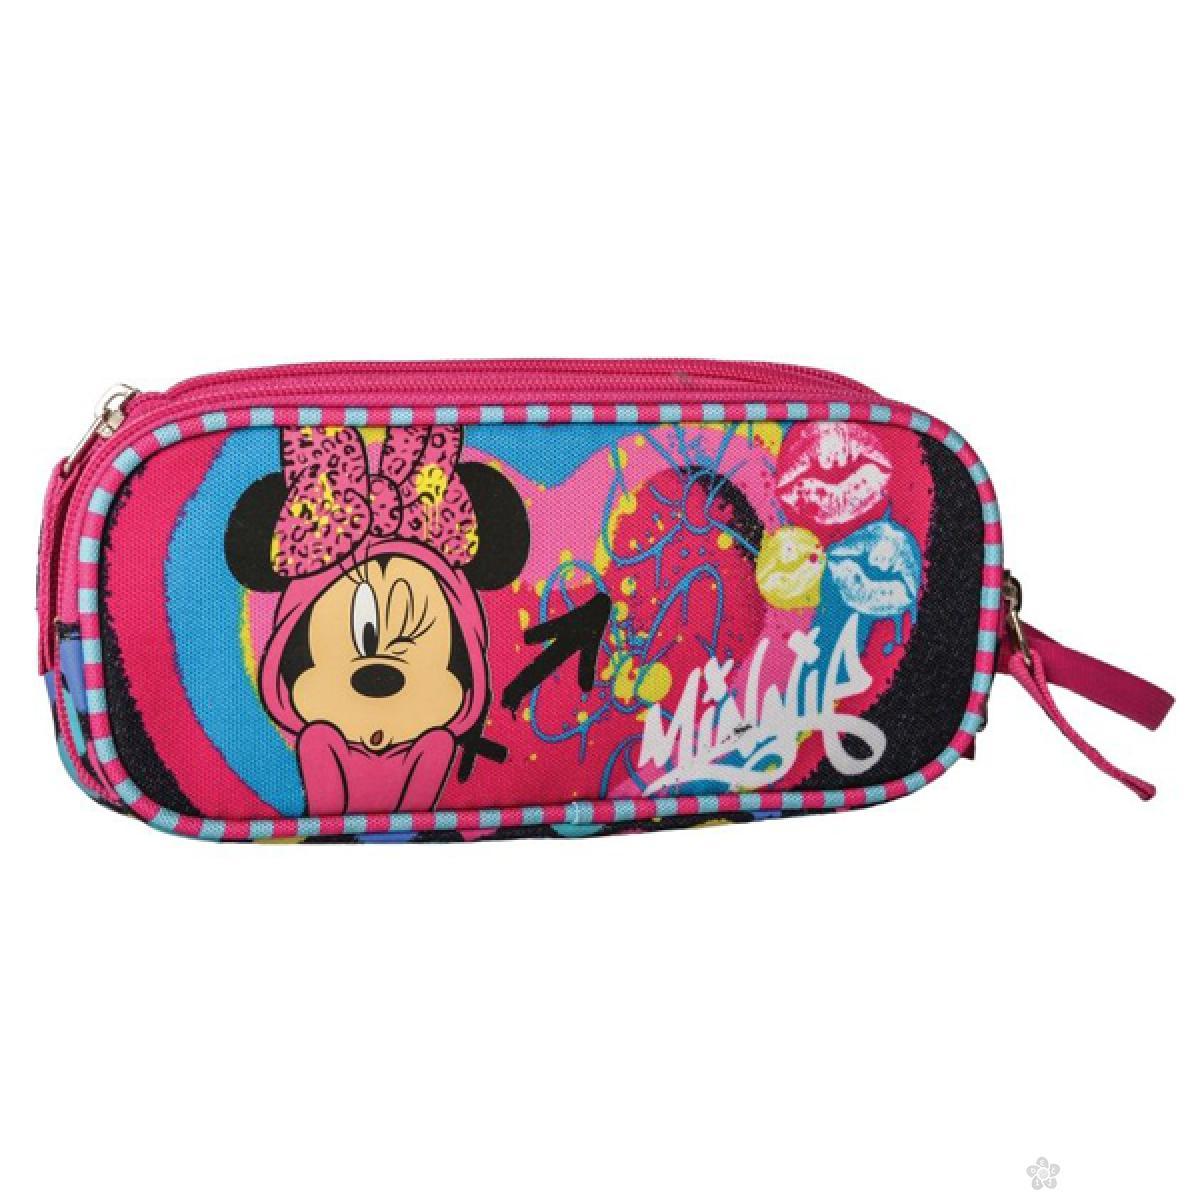 Pernica Minnie Mouse Heart sa dve pregrade 318046